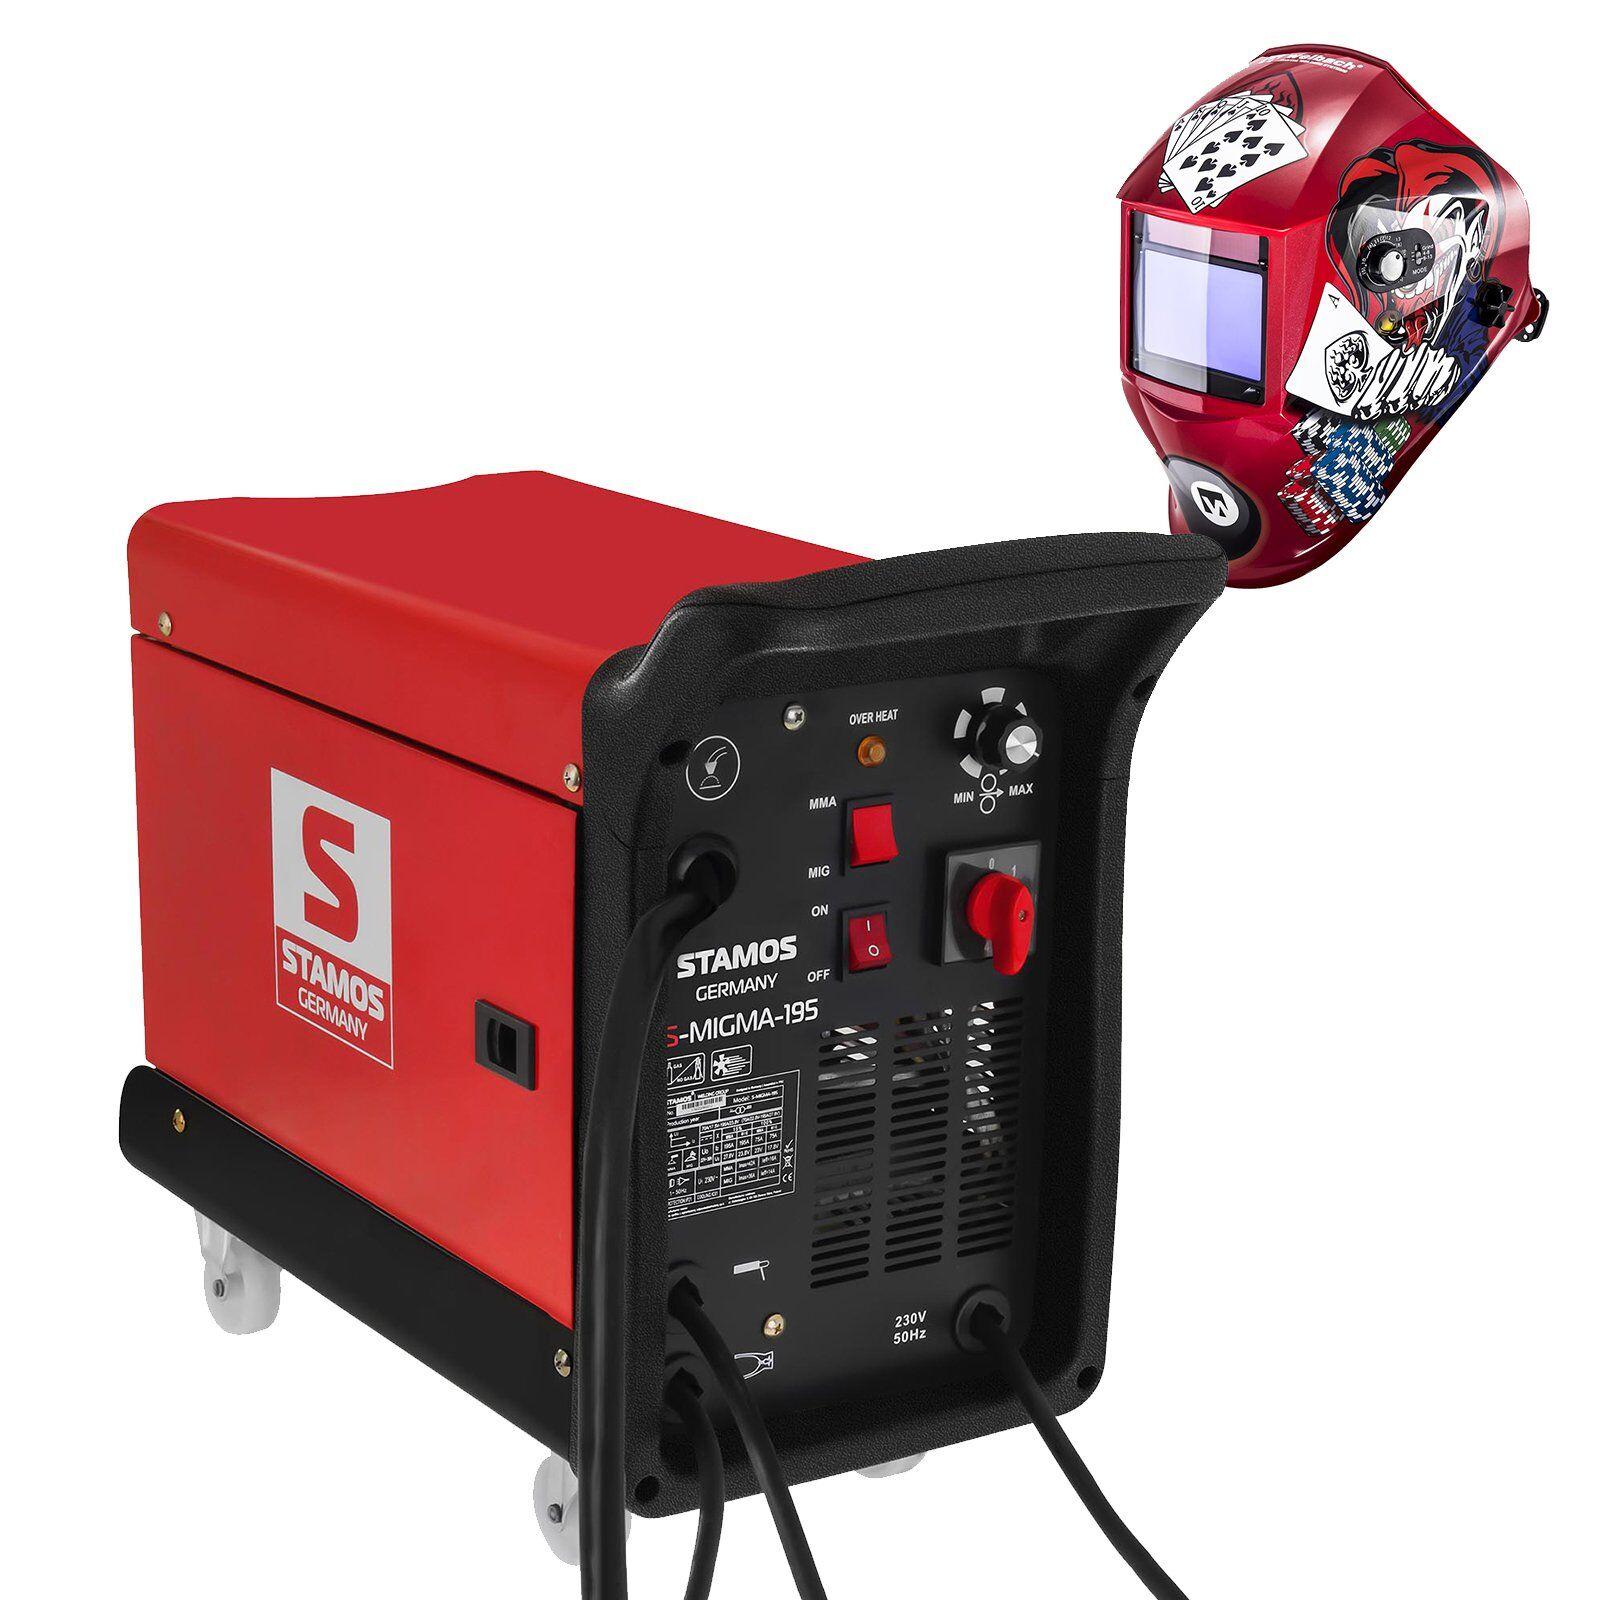 stamos germany set di saldatura saldatrice multiprocesso - 195 a - 230 v - portatile + maschera da saldatore - pokerface - professional series